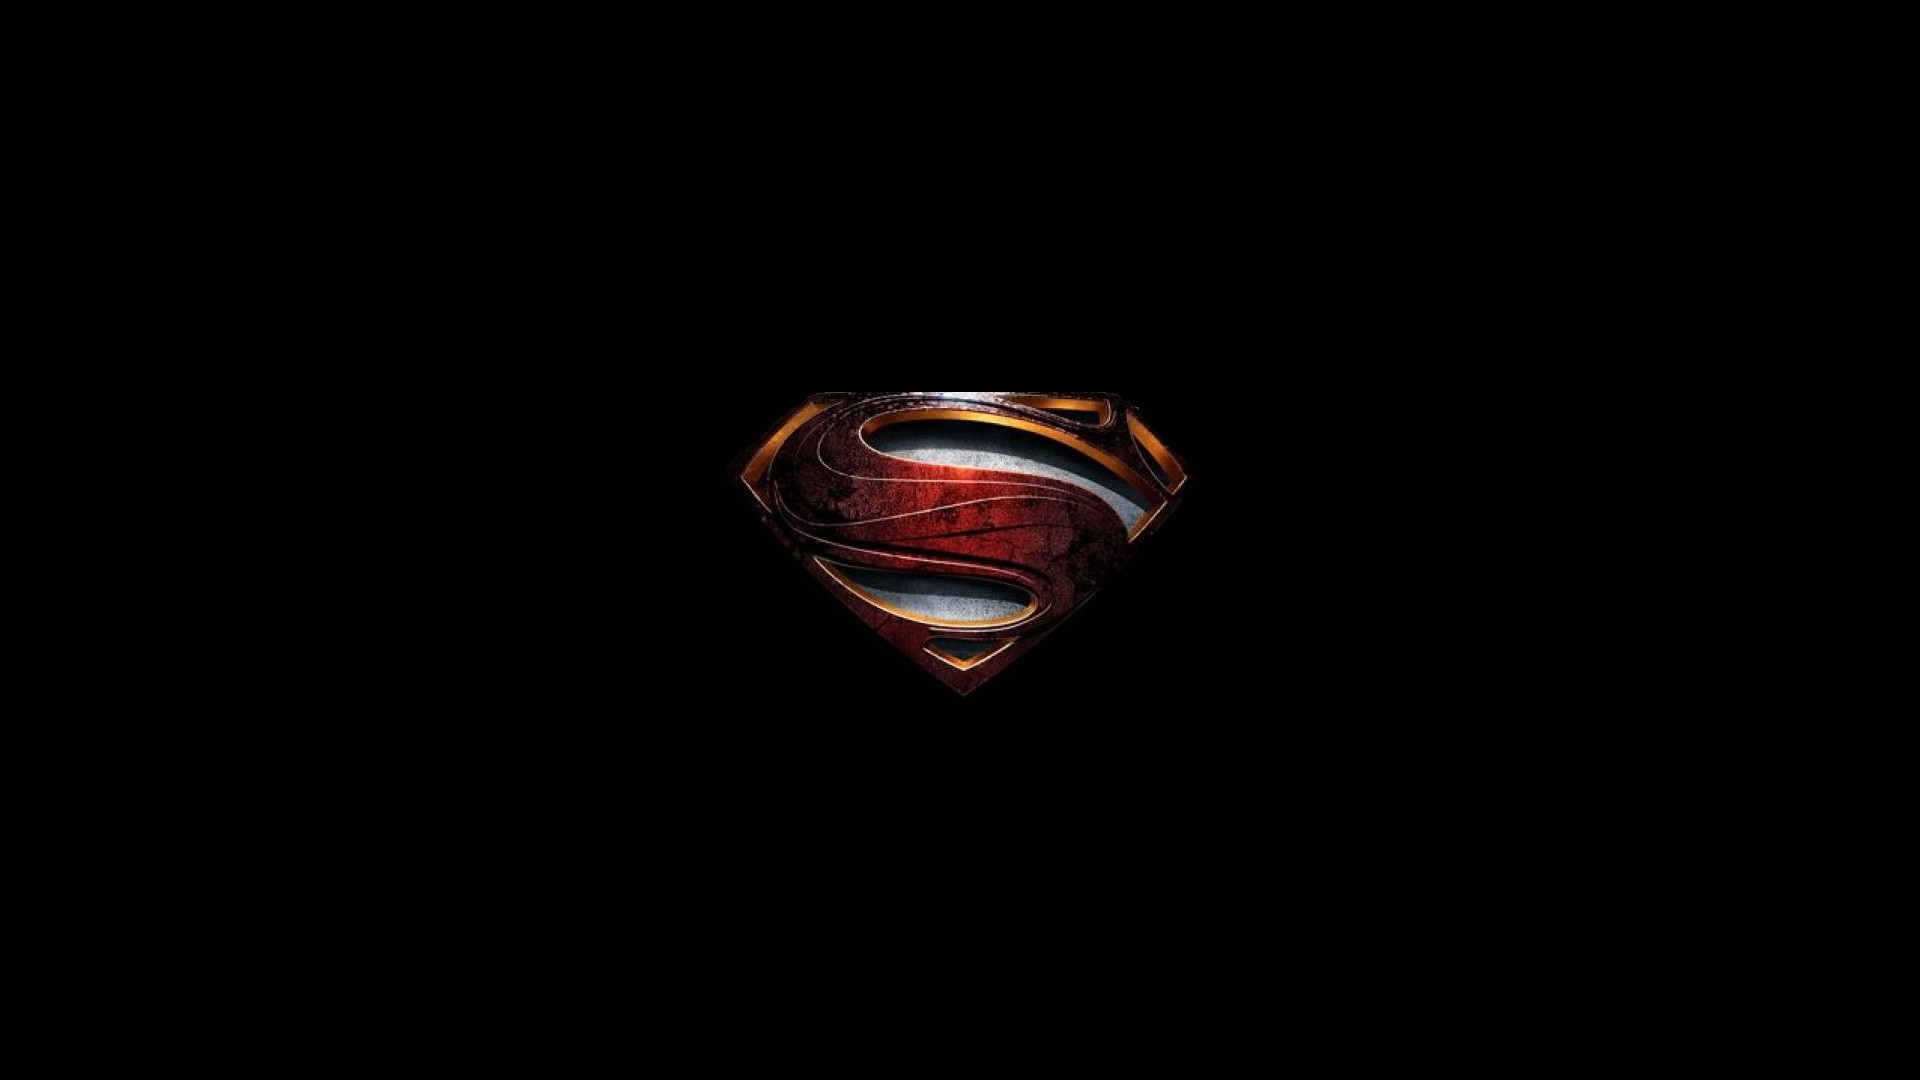 Super Hero Wallpaper (67+ images)